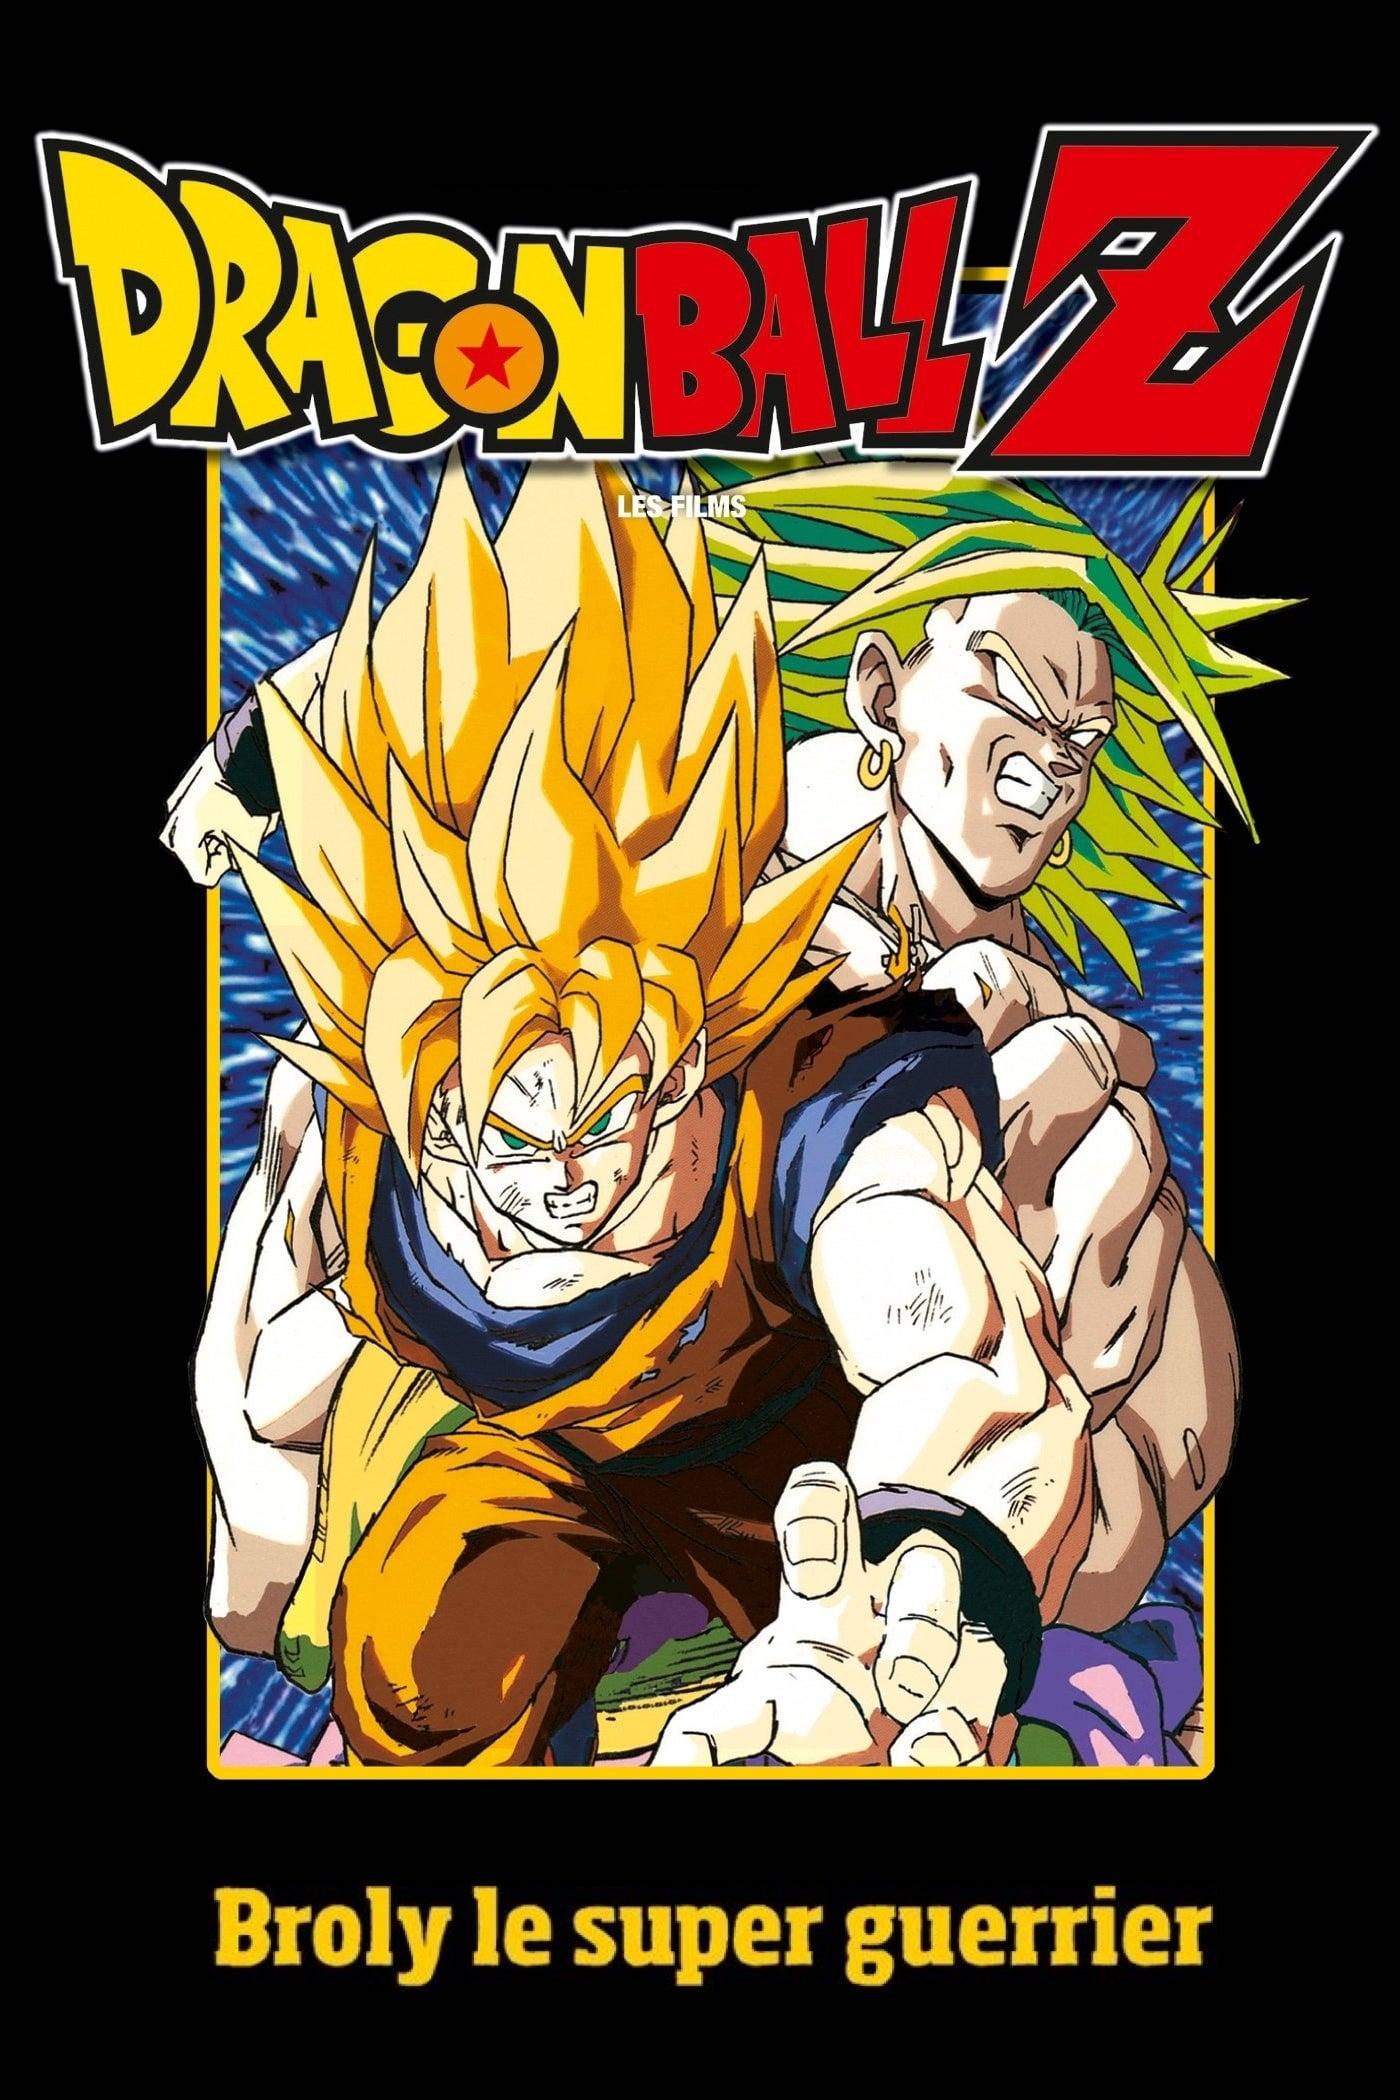 Dragon Ball Z - Broly le super guerrier